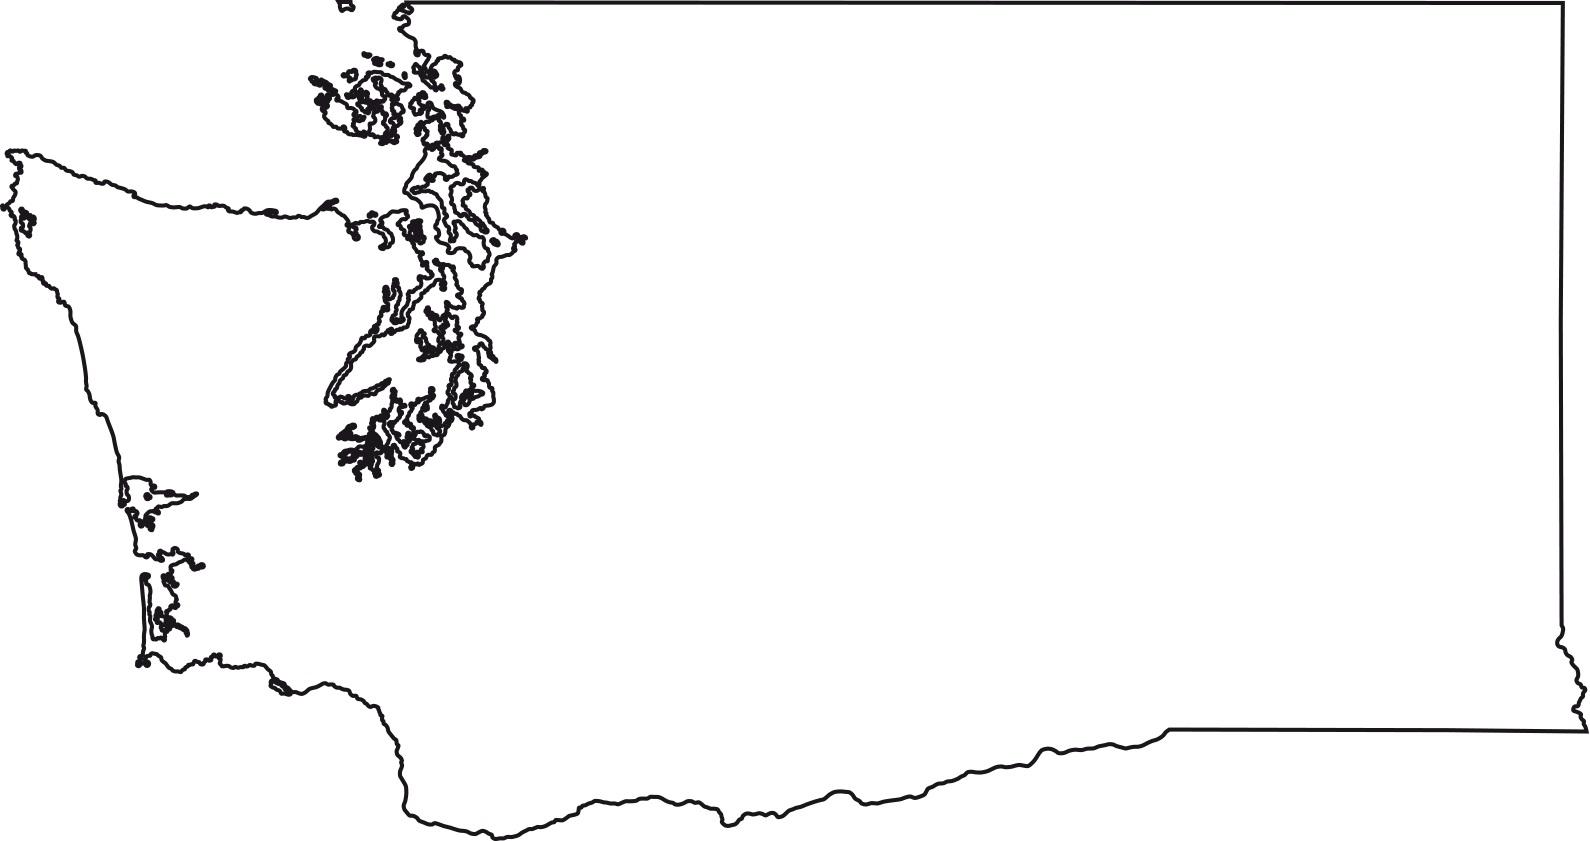 Washington blank outline Map | Large Printable High Resolution and Standard Map